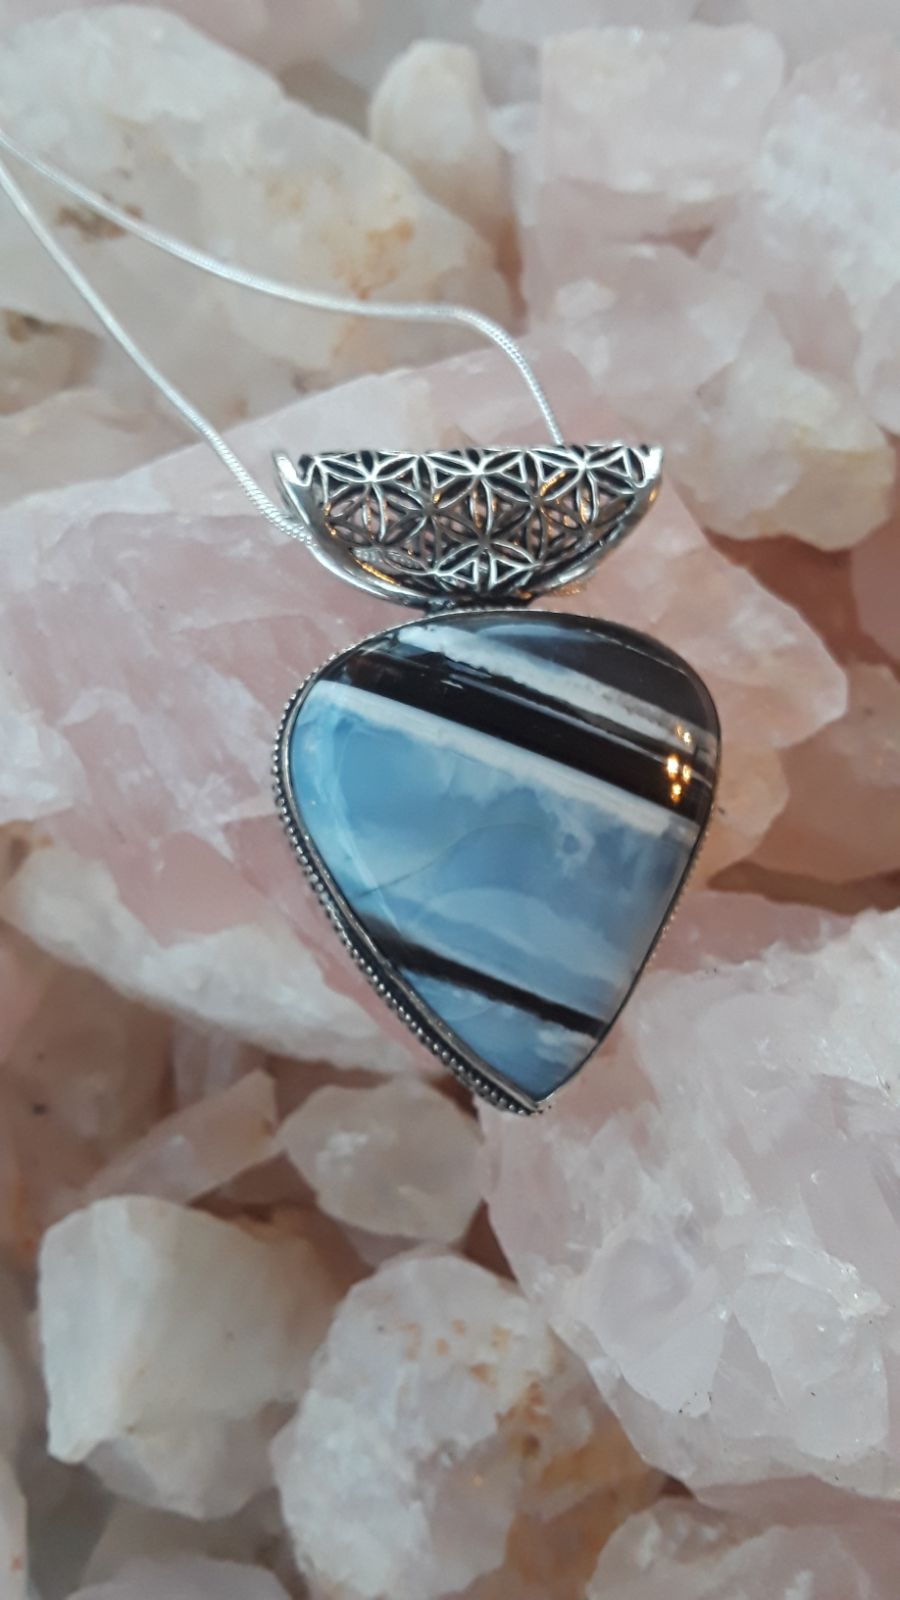 Rare blue lace agate stone pendant with